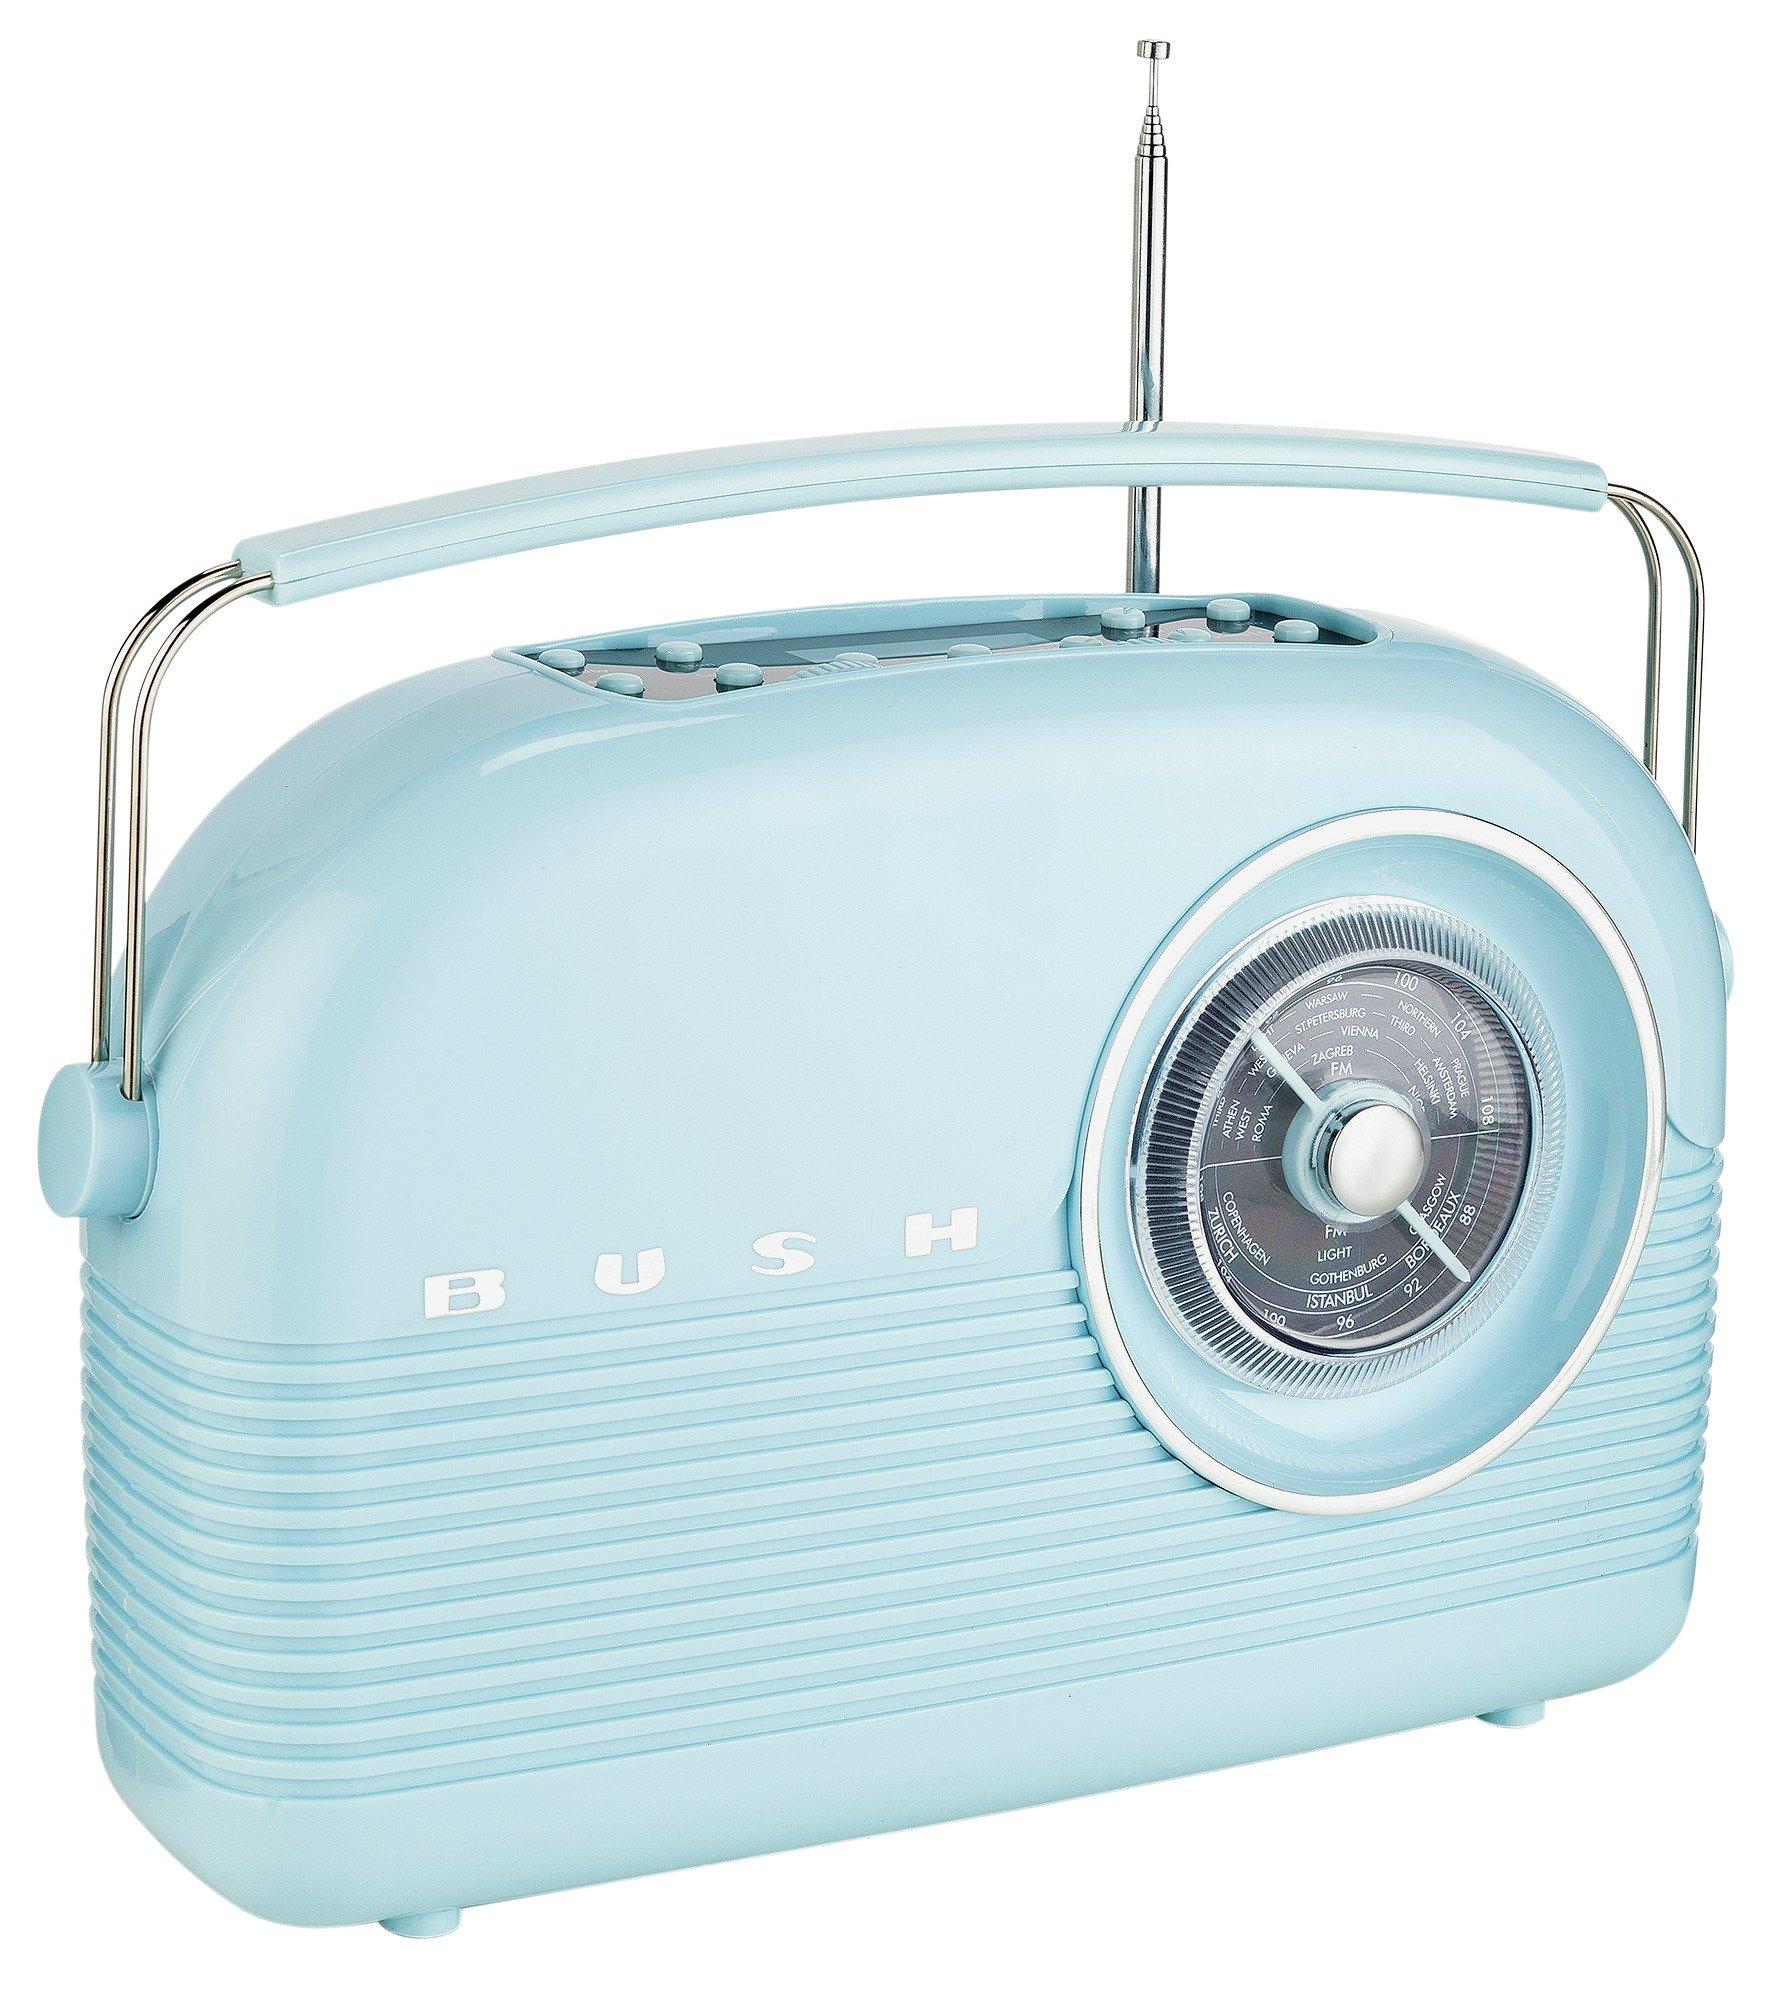 Image of Bush - Classic Retro DAB Radio - Cornflower Blue